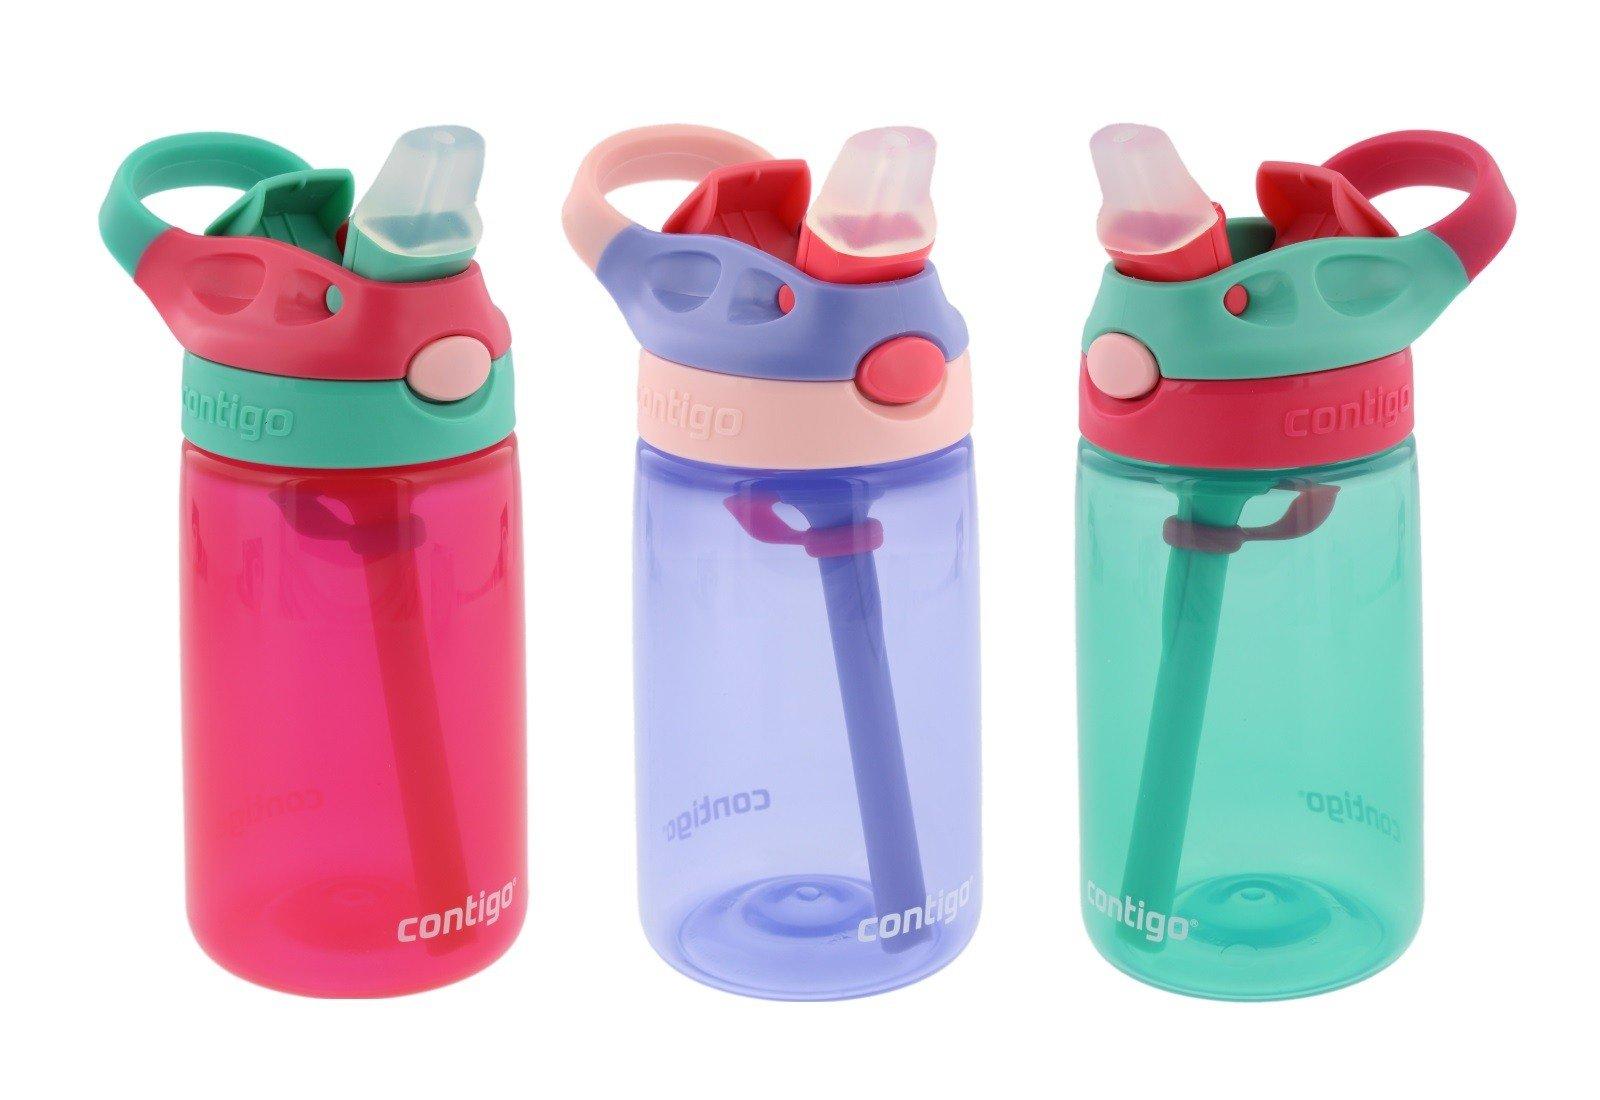 Contigo Kids Autospout Gizmo Water Bottles, 14oz (Cherry Blossom, Persian Green, & Lavender)